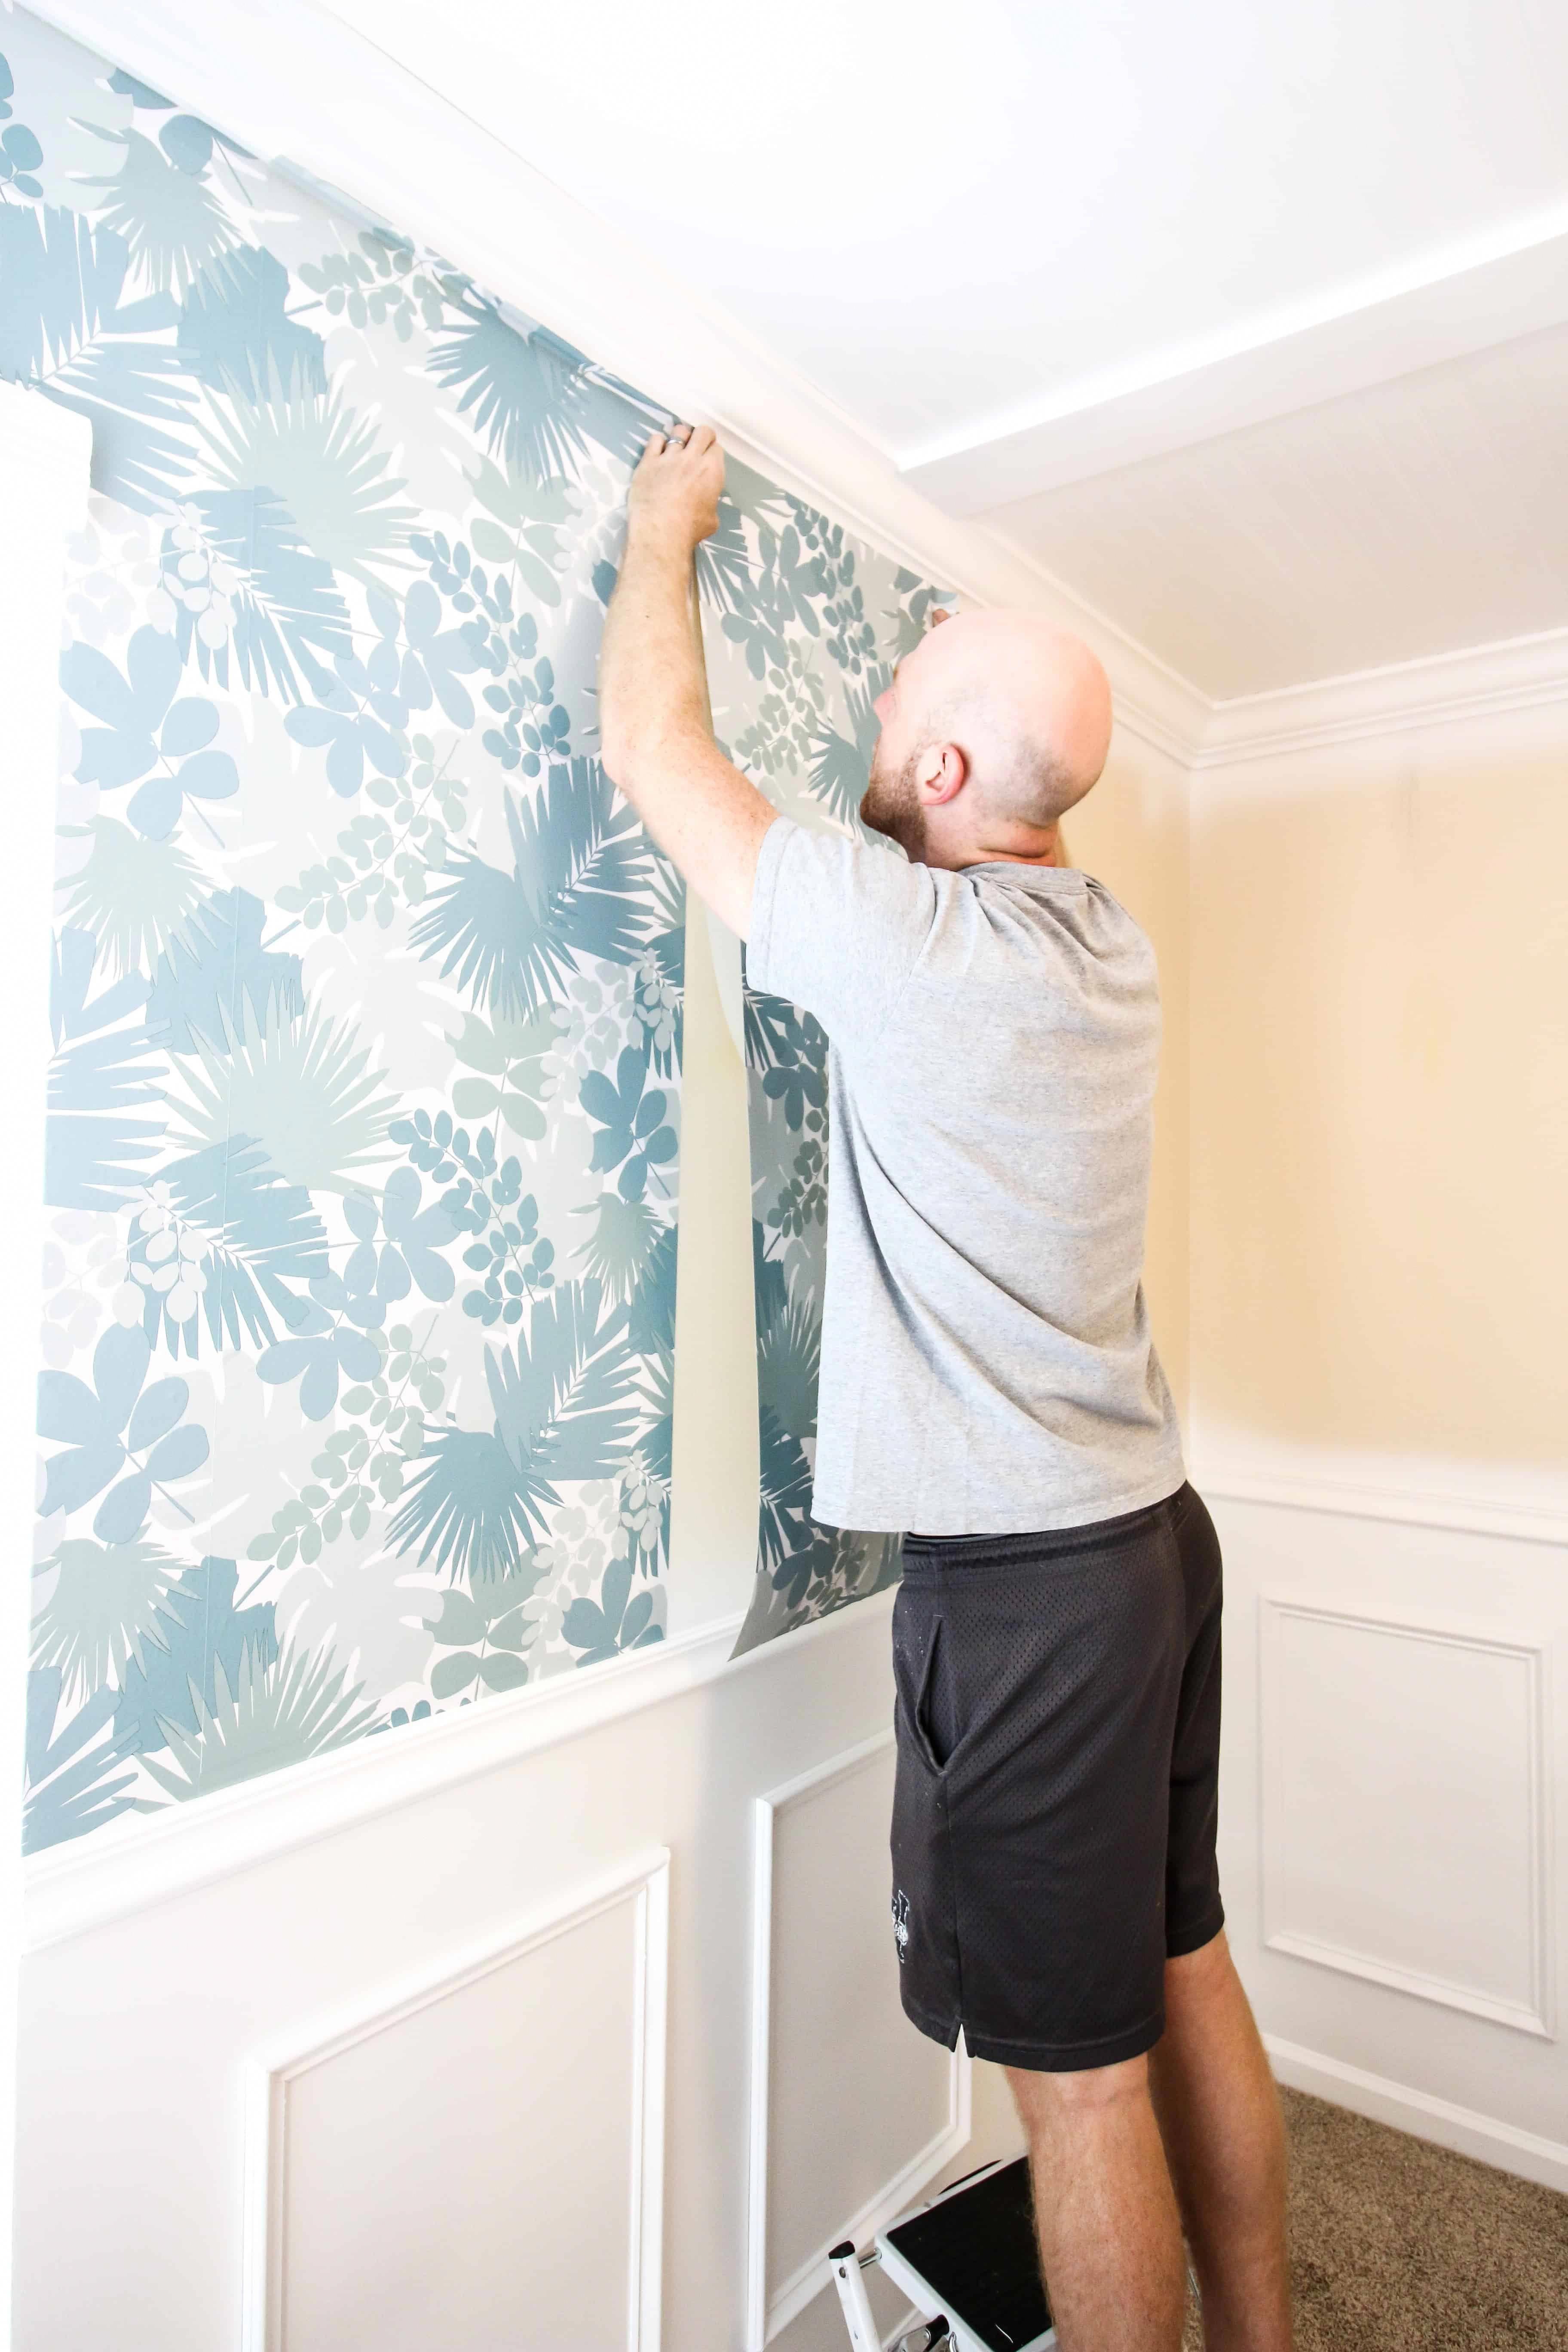 How to Hang Peel & Stick Wallpaper homedecoratingtips